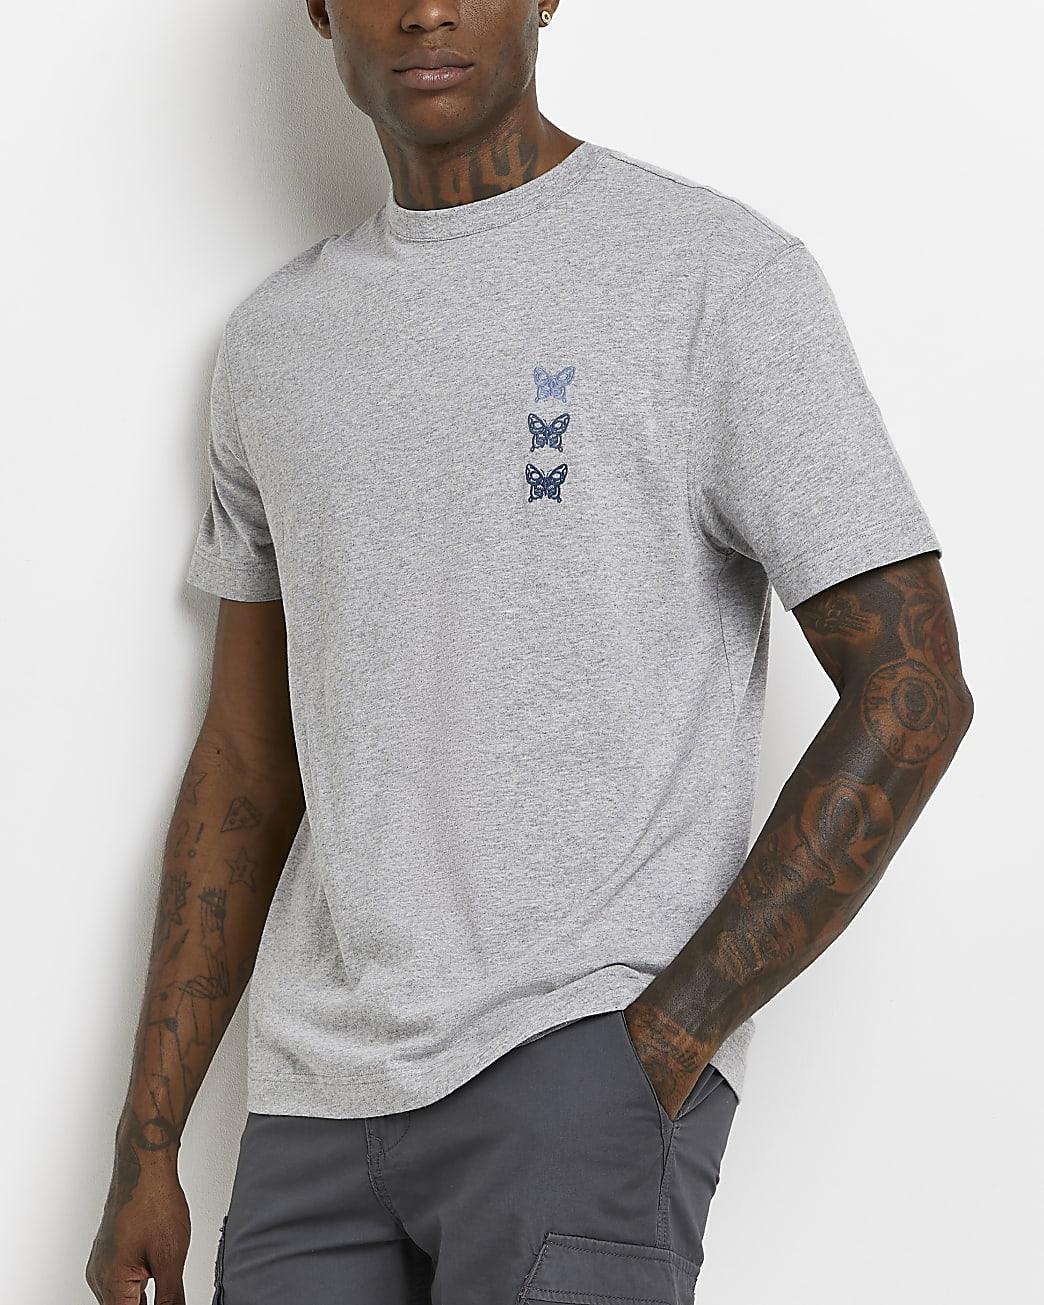 Grey regular fit graphic t-shirt